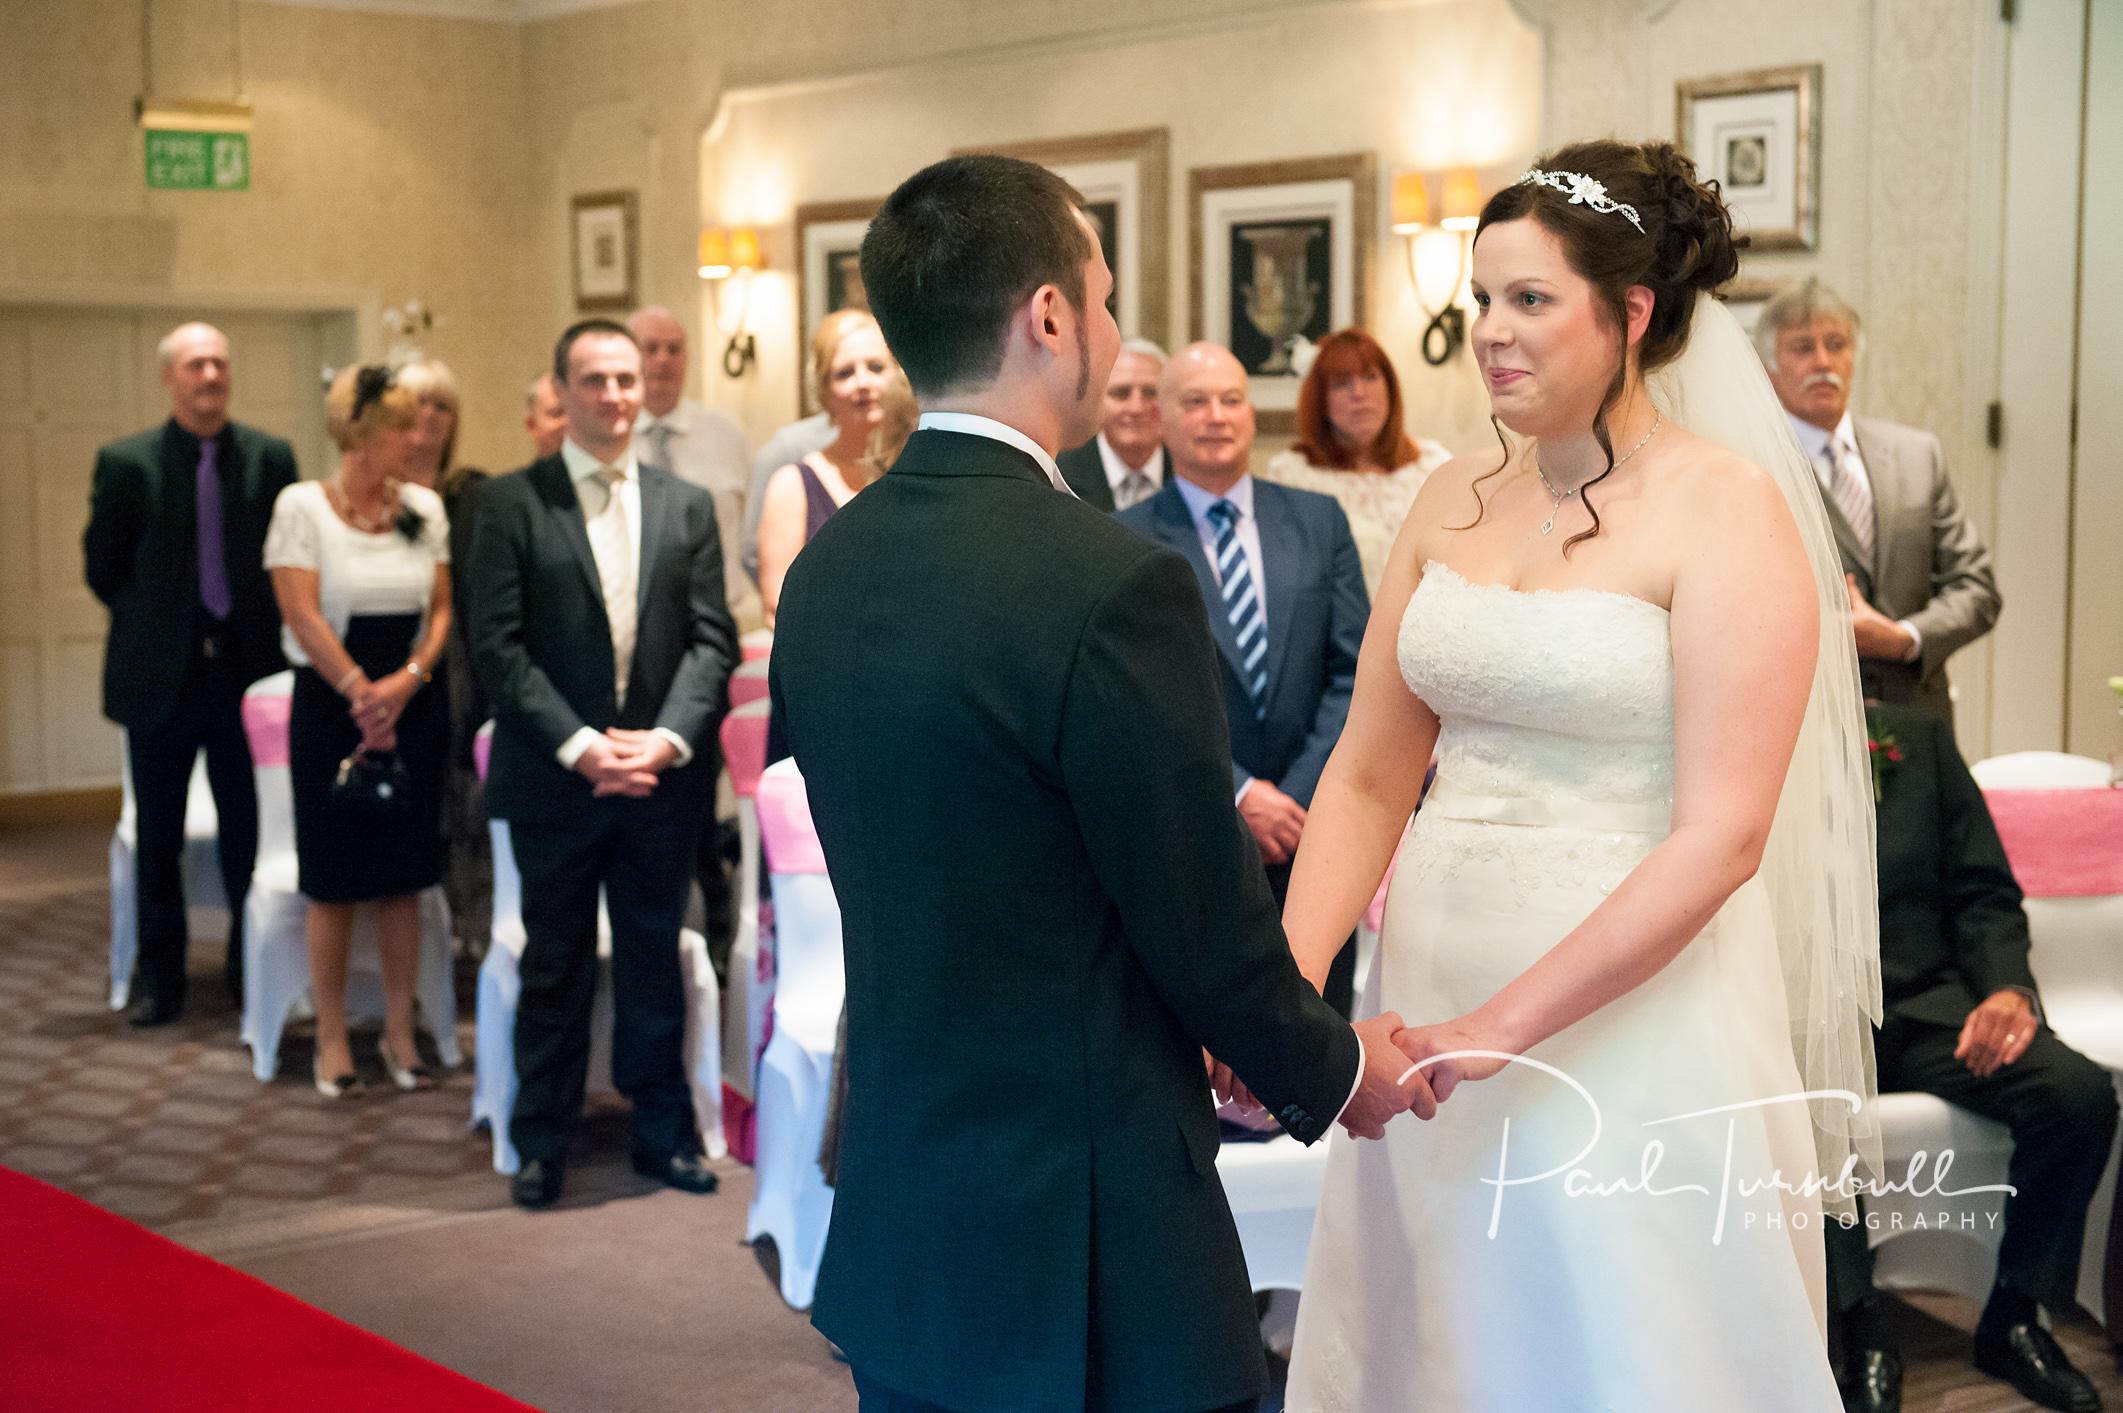 wedding-photography-wood-hall-wetherby-yorkshire-032.jpg